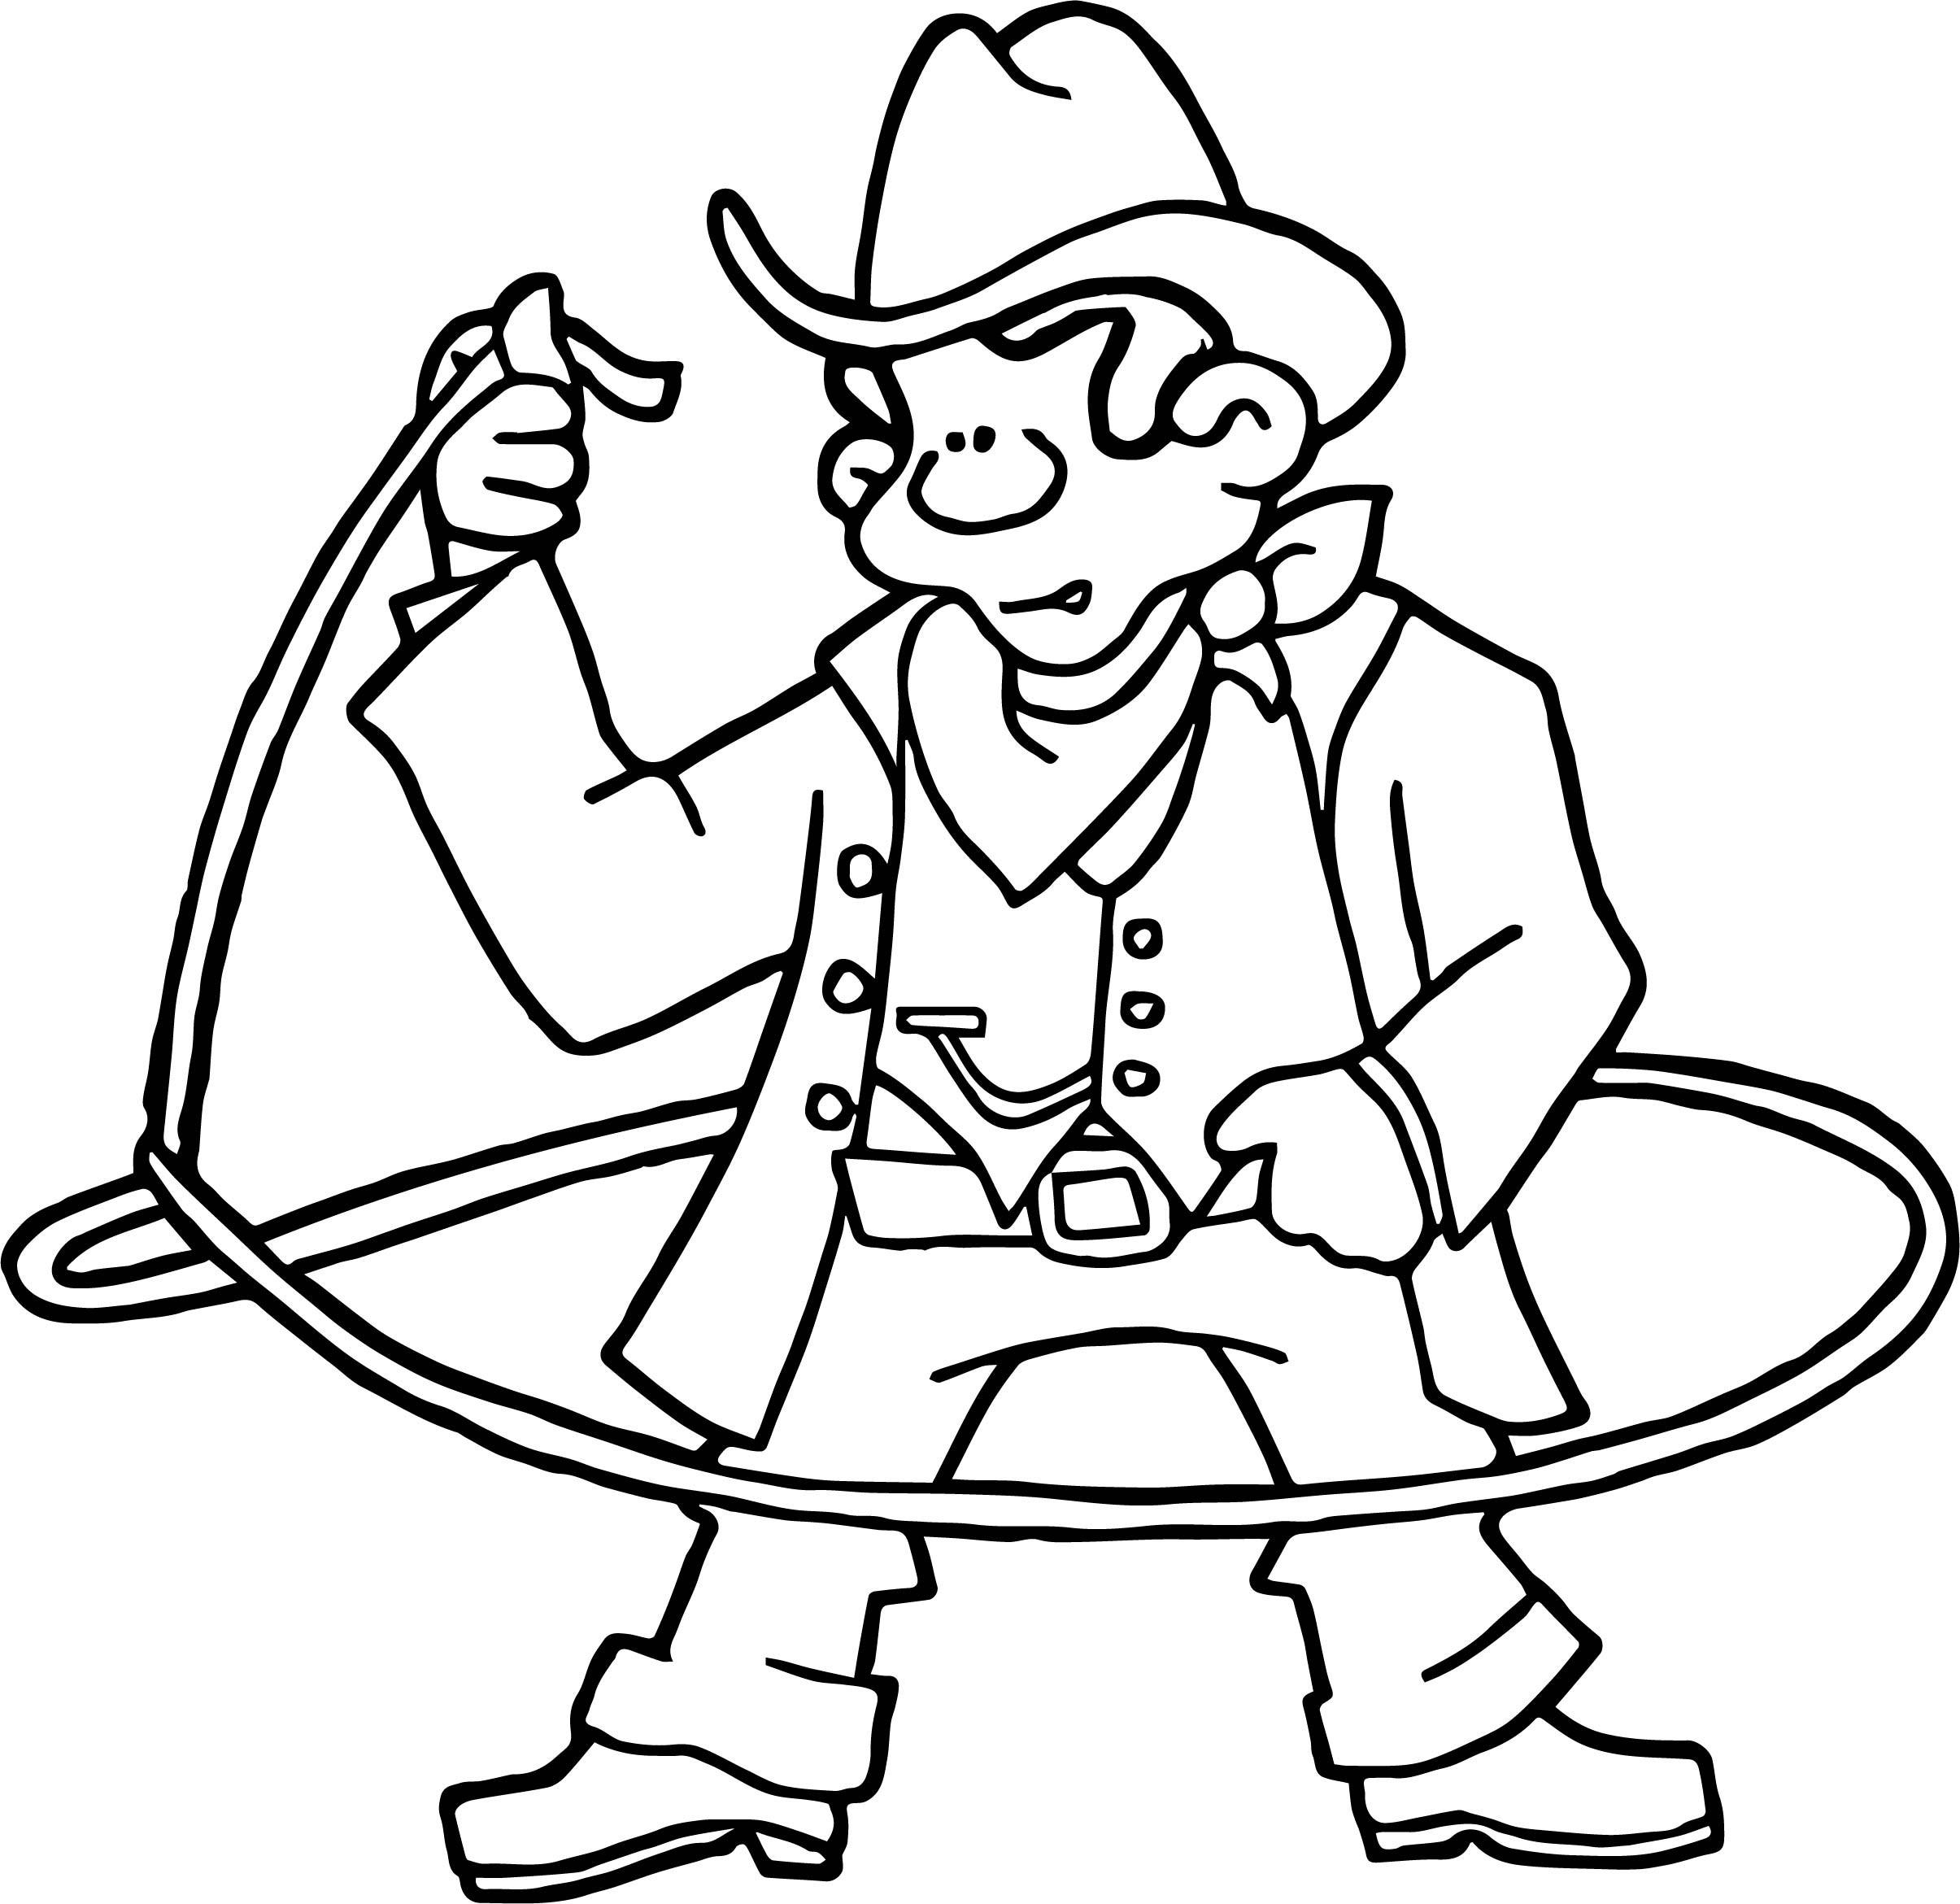 2410x2341 American Revolution History Cowboy Coloring Page Wecoloringpage